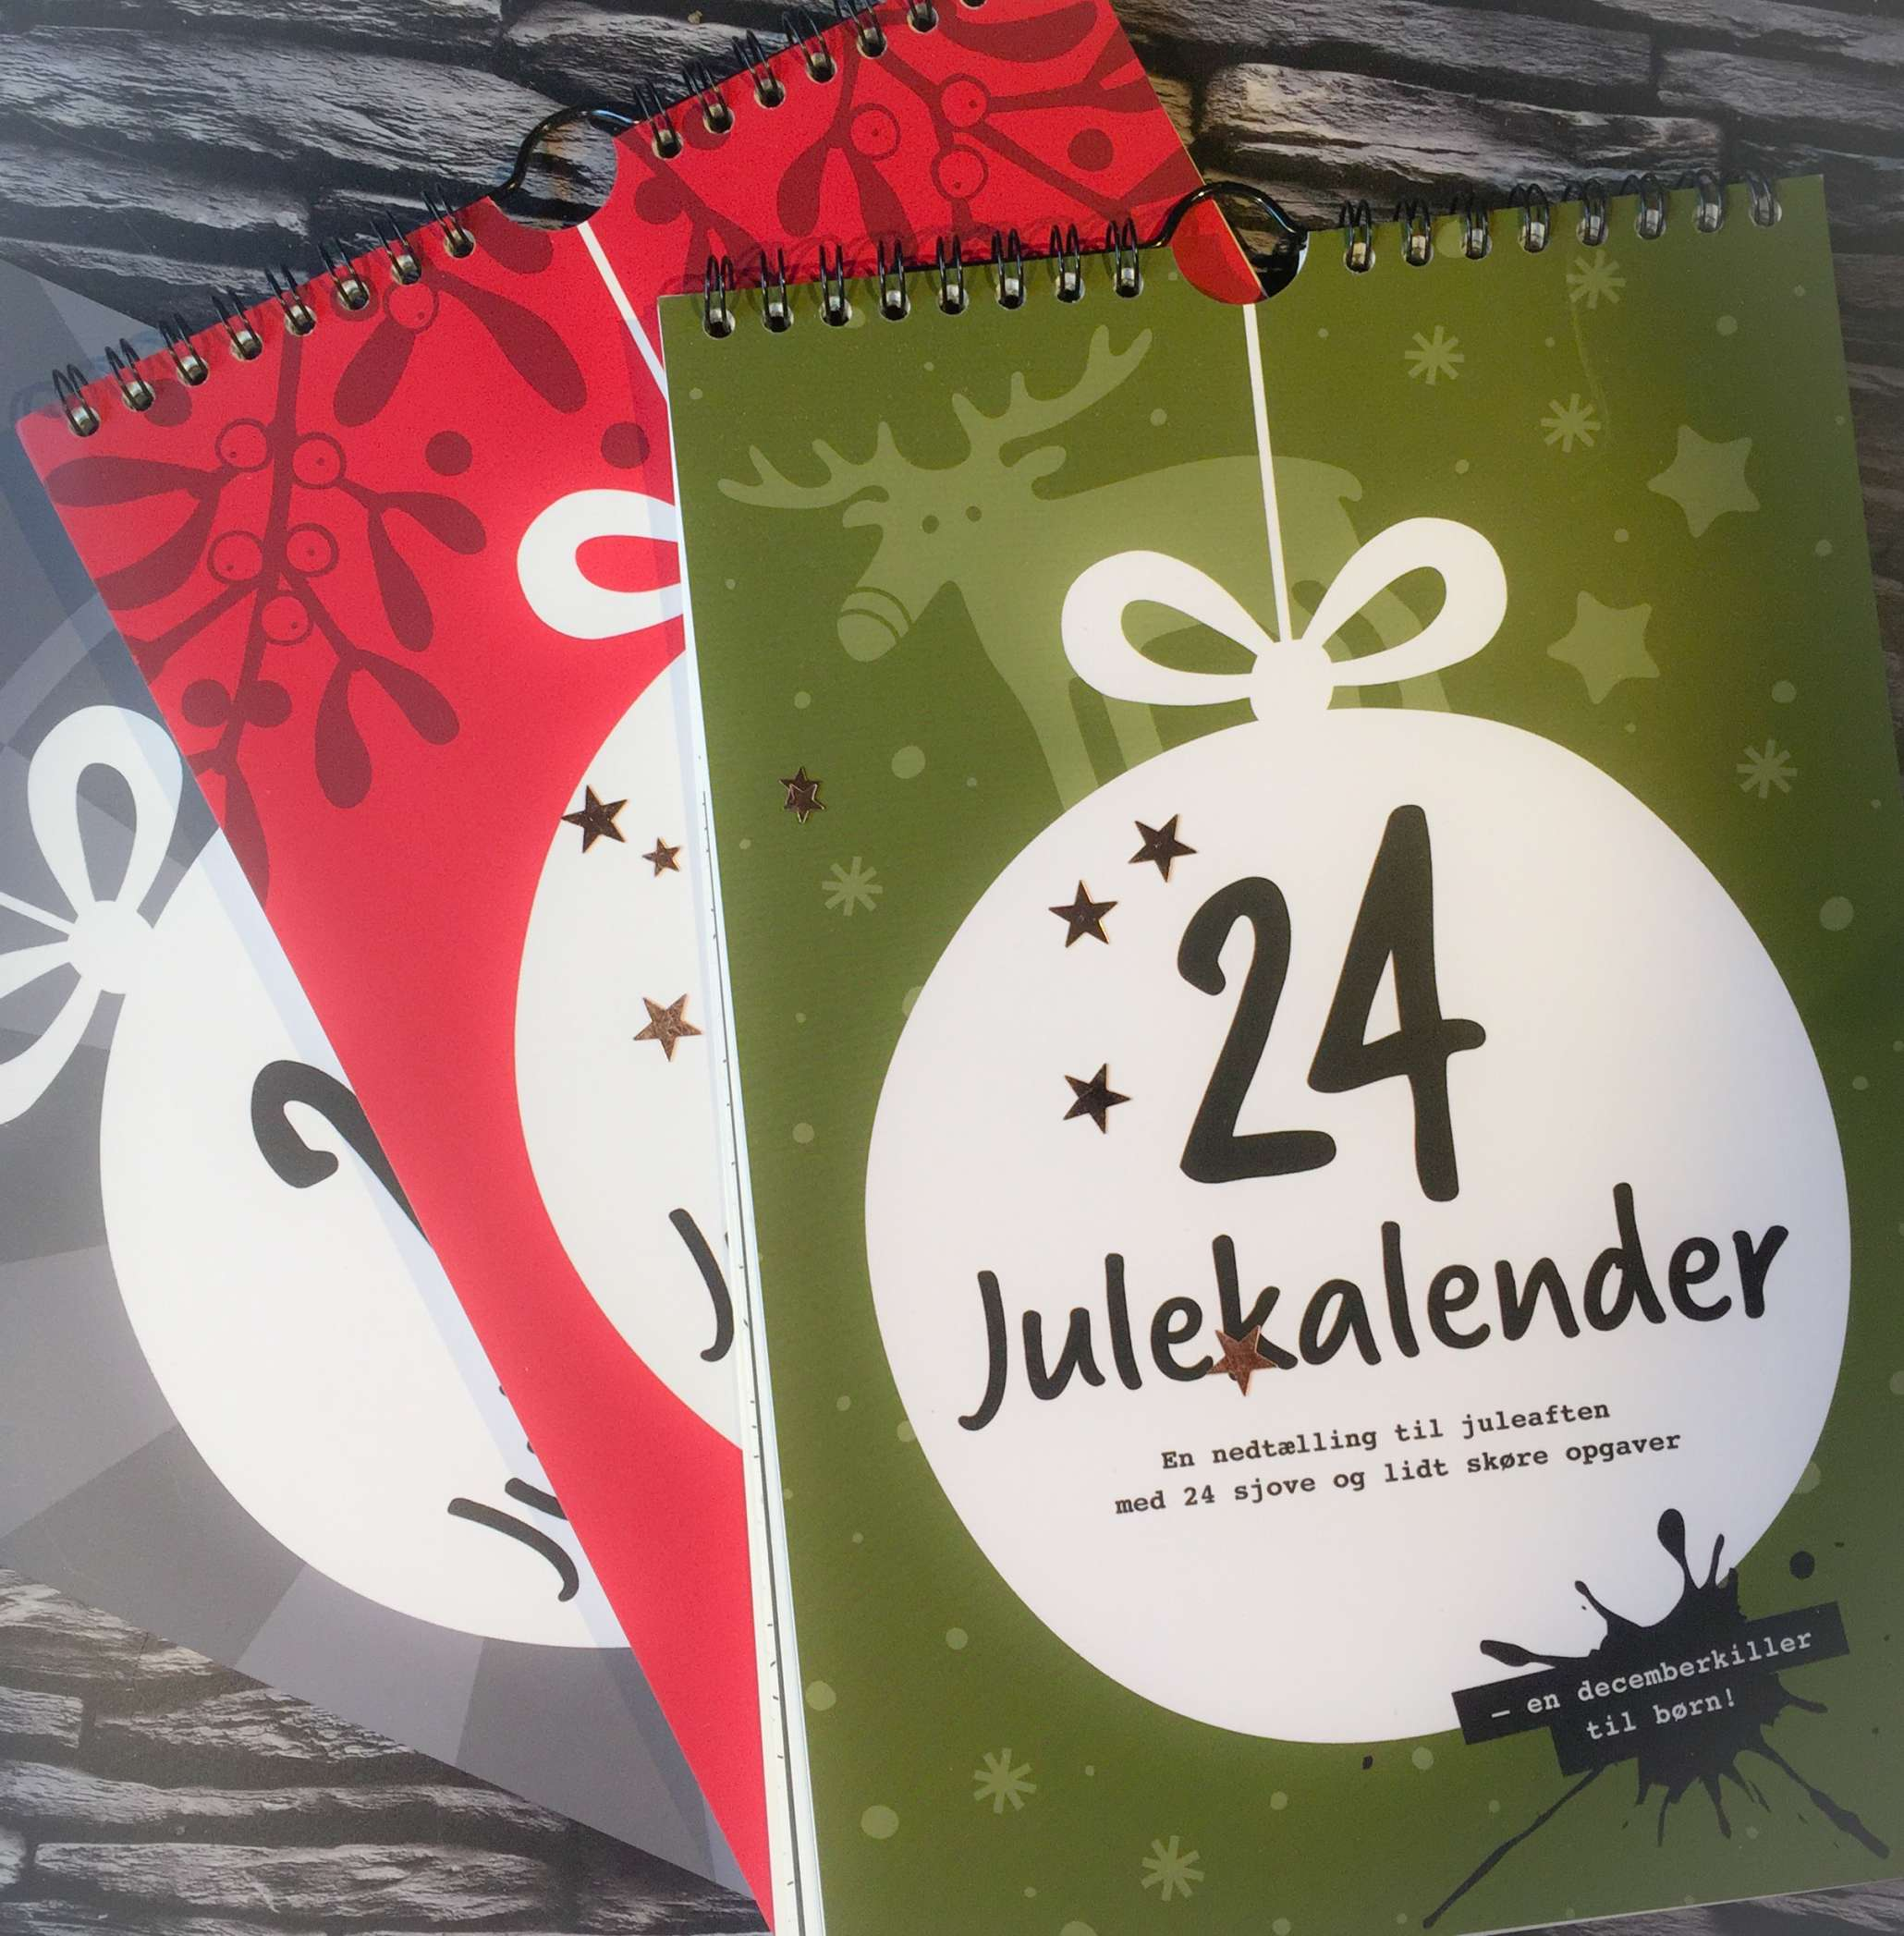 Julekalender, Julekalender 2017, 24Julekalender, 24 Julekalender, Julekalender Grøn, Julekalender Rød, Julekalender Grå, Julekalender til Juleskeptikere, Julekalender til Juleelskere, Julekalender Børn